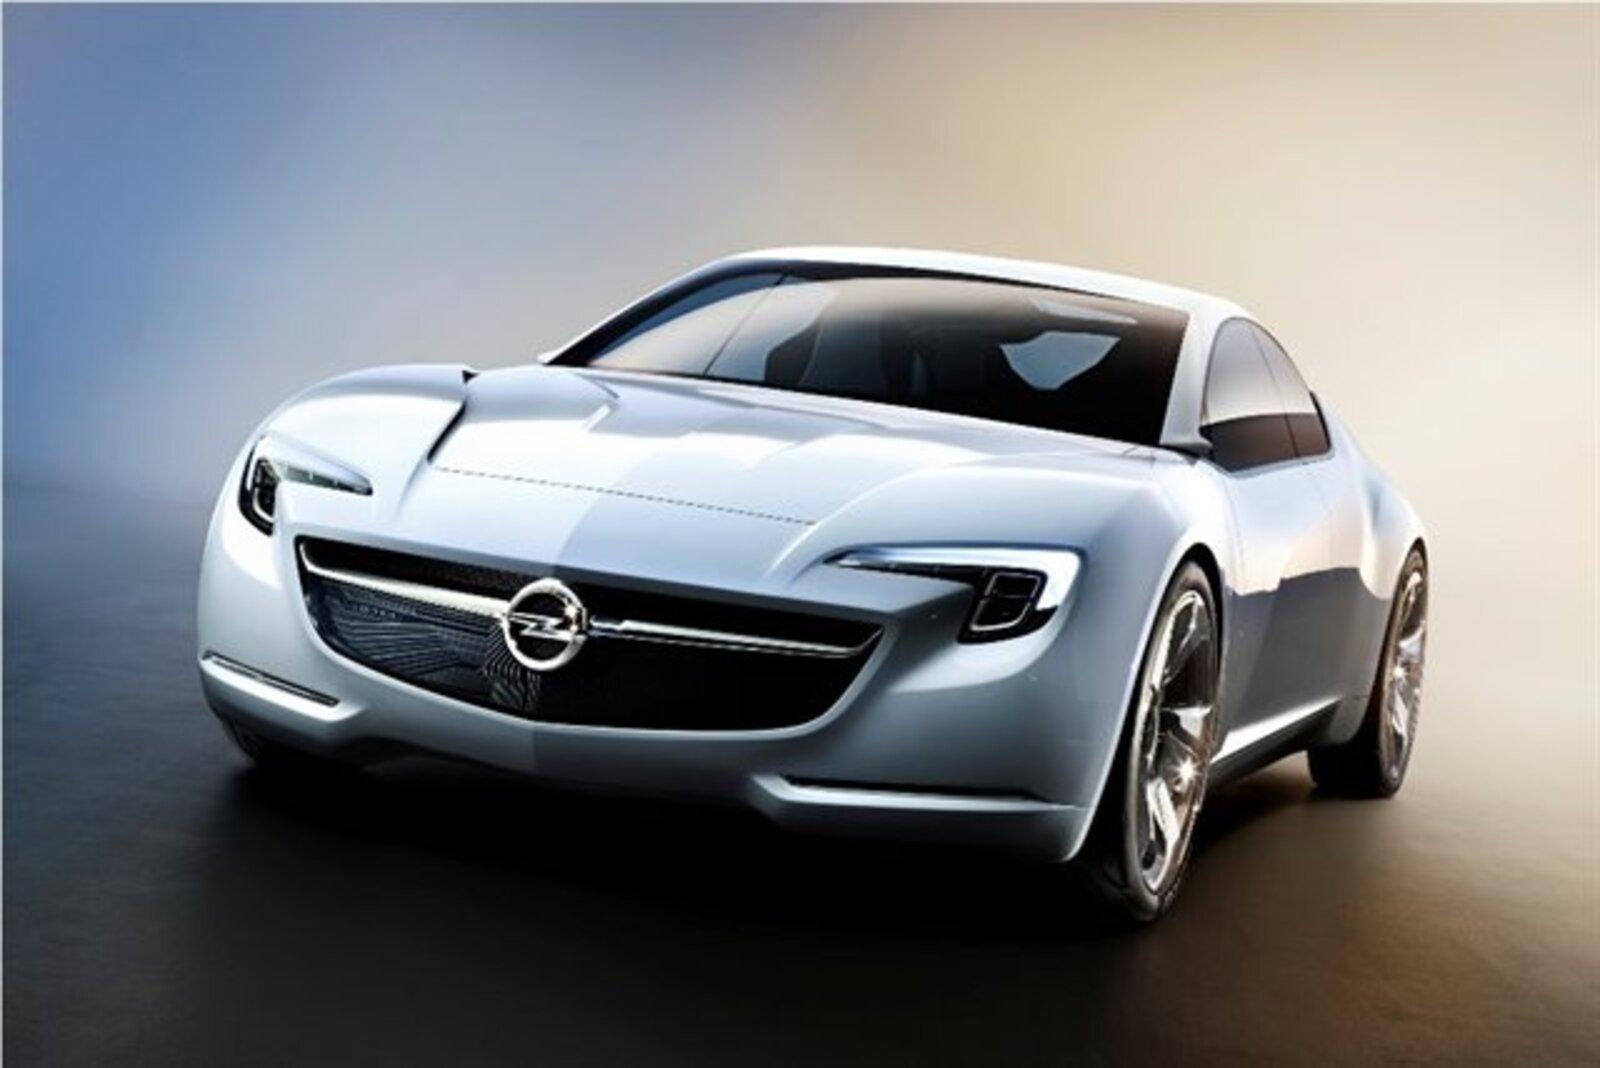 Opel Flextreme (2007)